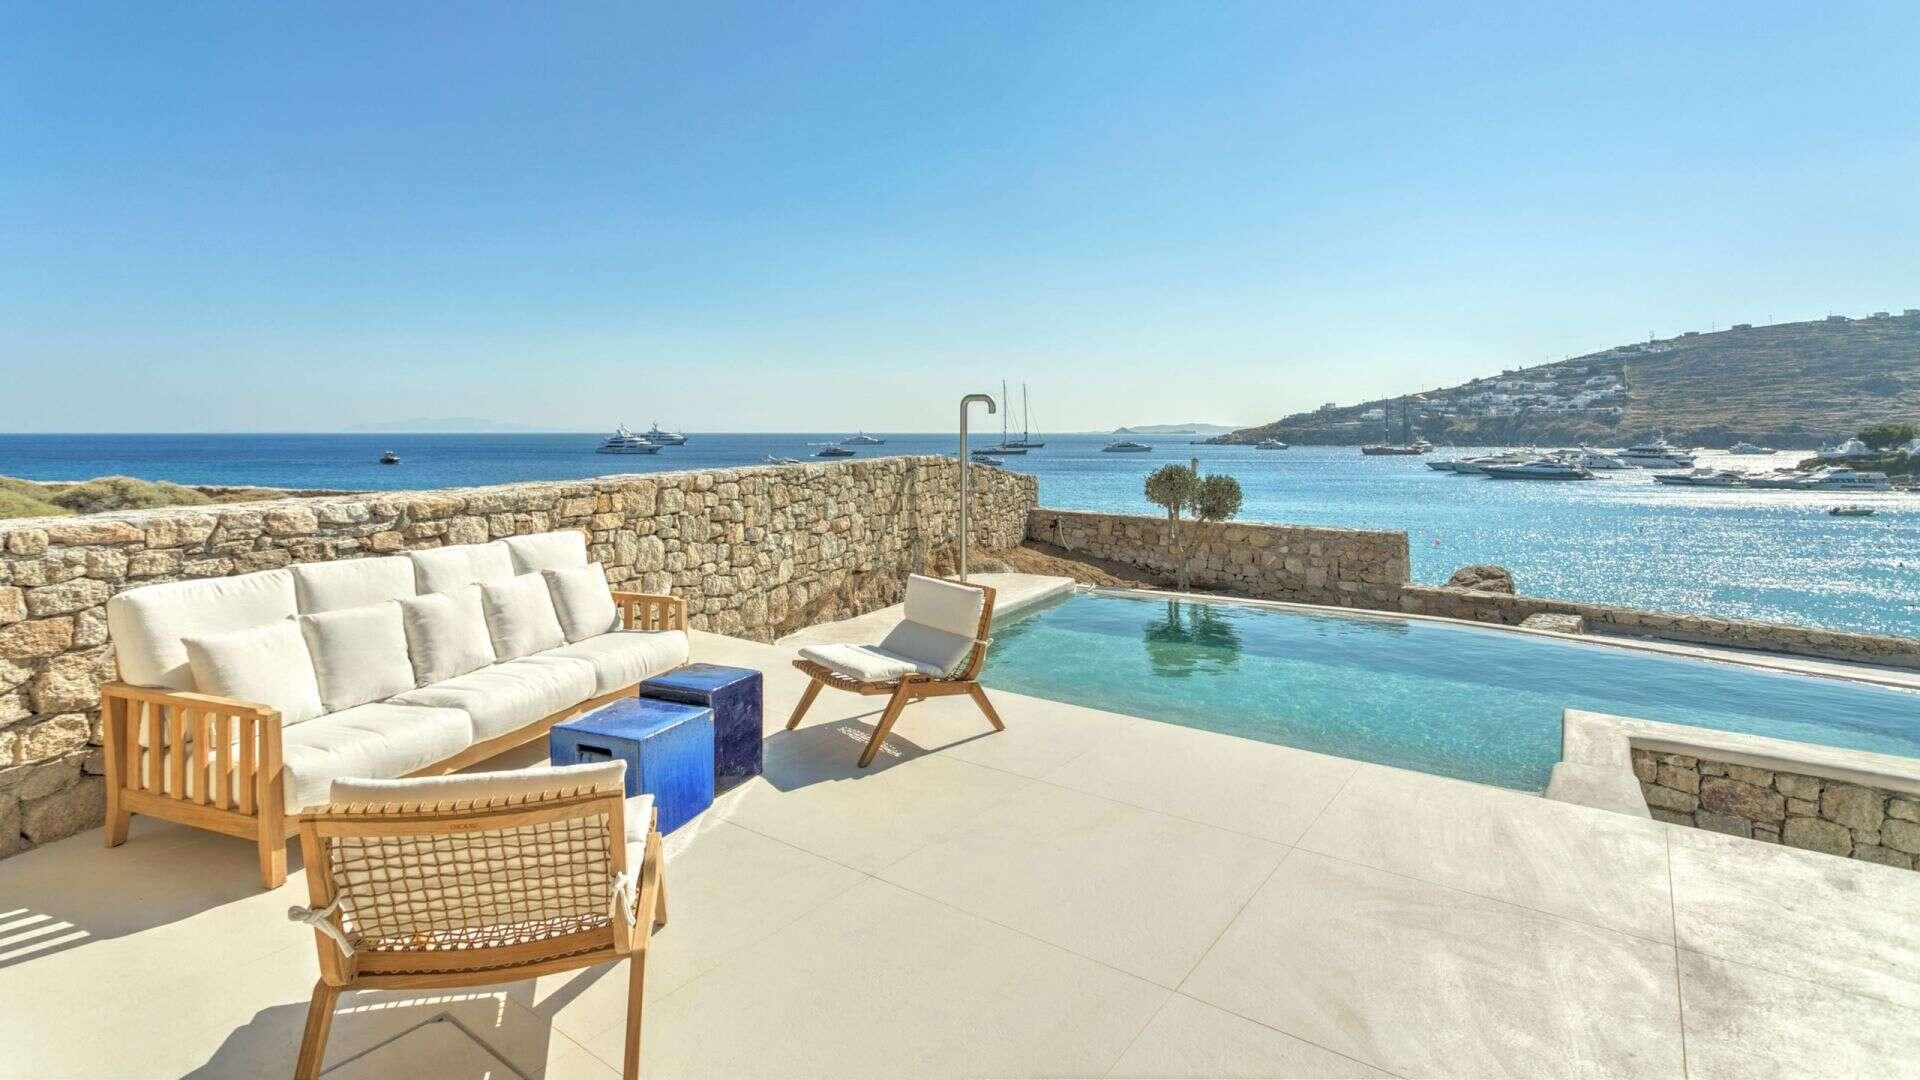 Luxury vacation rentals europe - Greece - Mykonos - Platis gialos - Artemide - Image 1/25